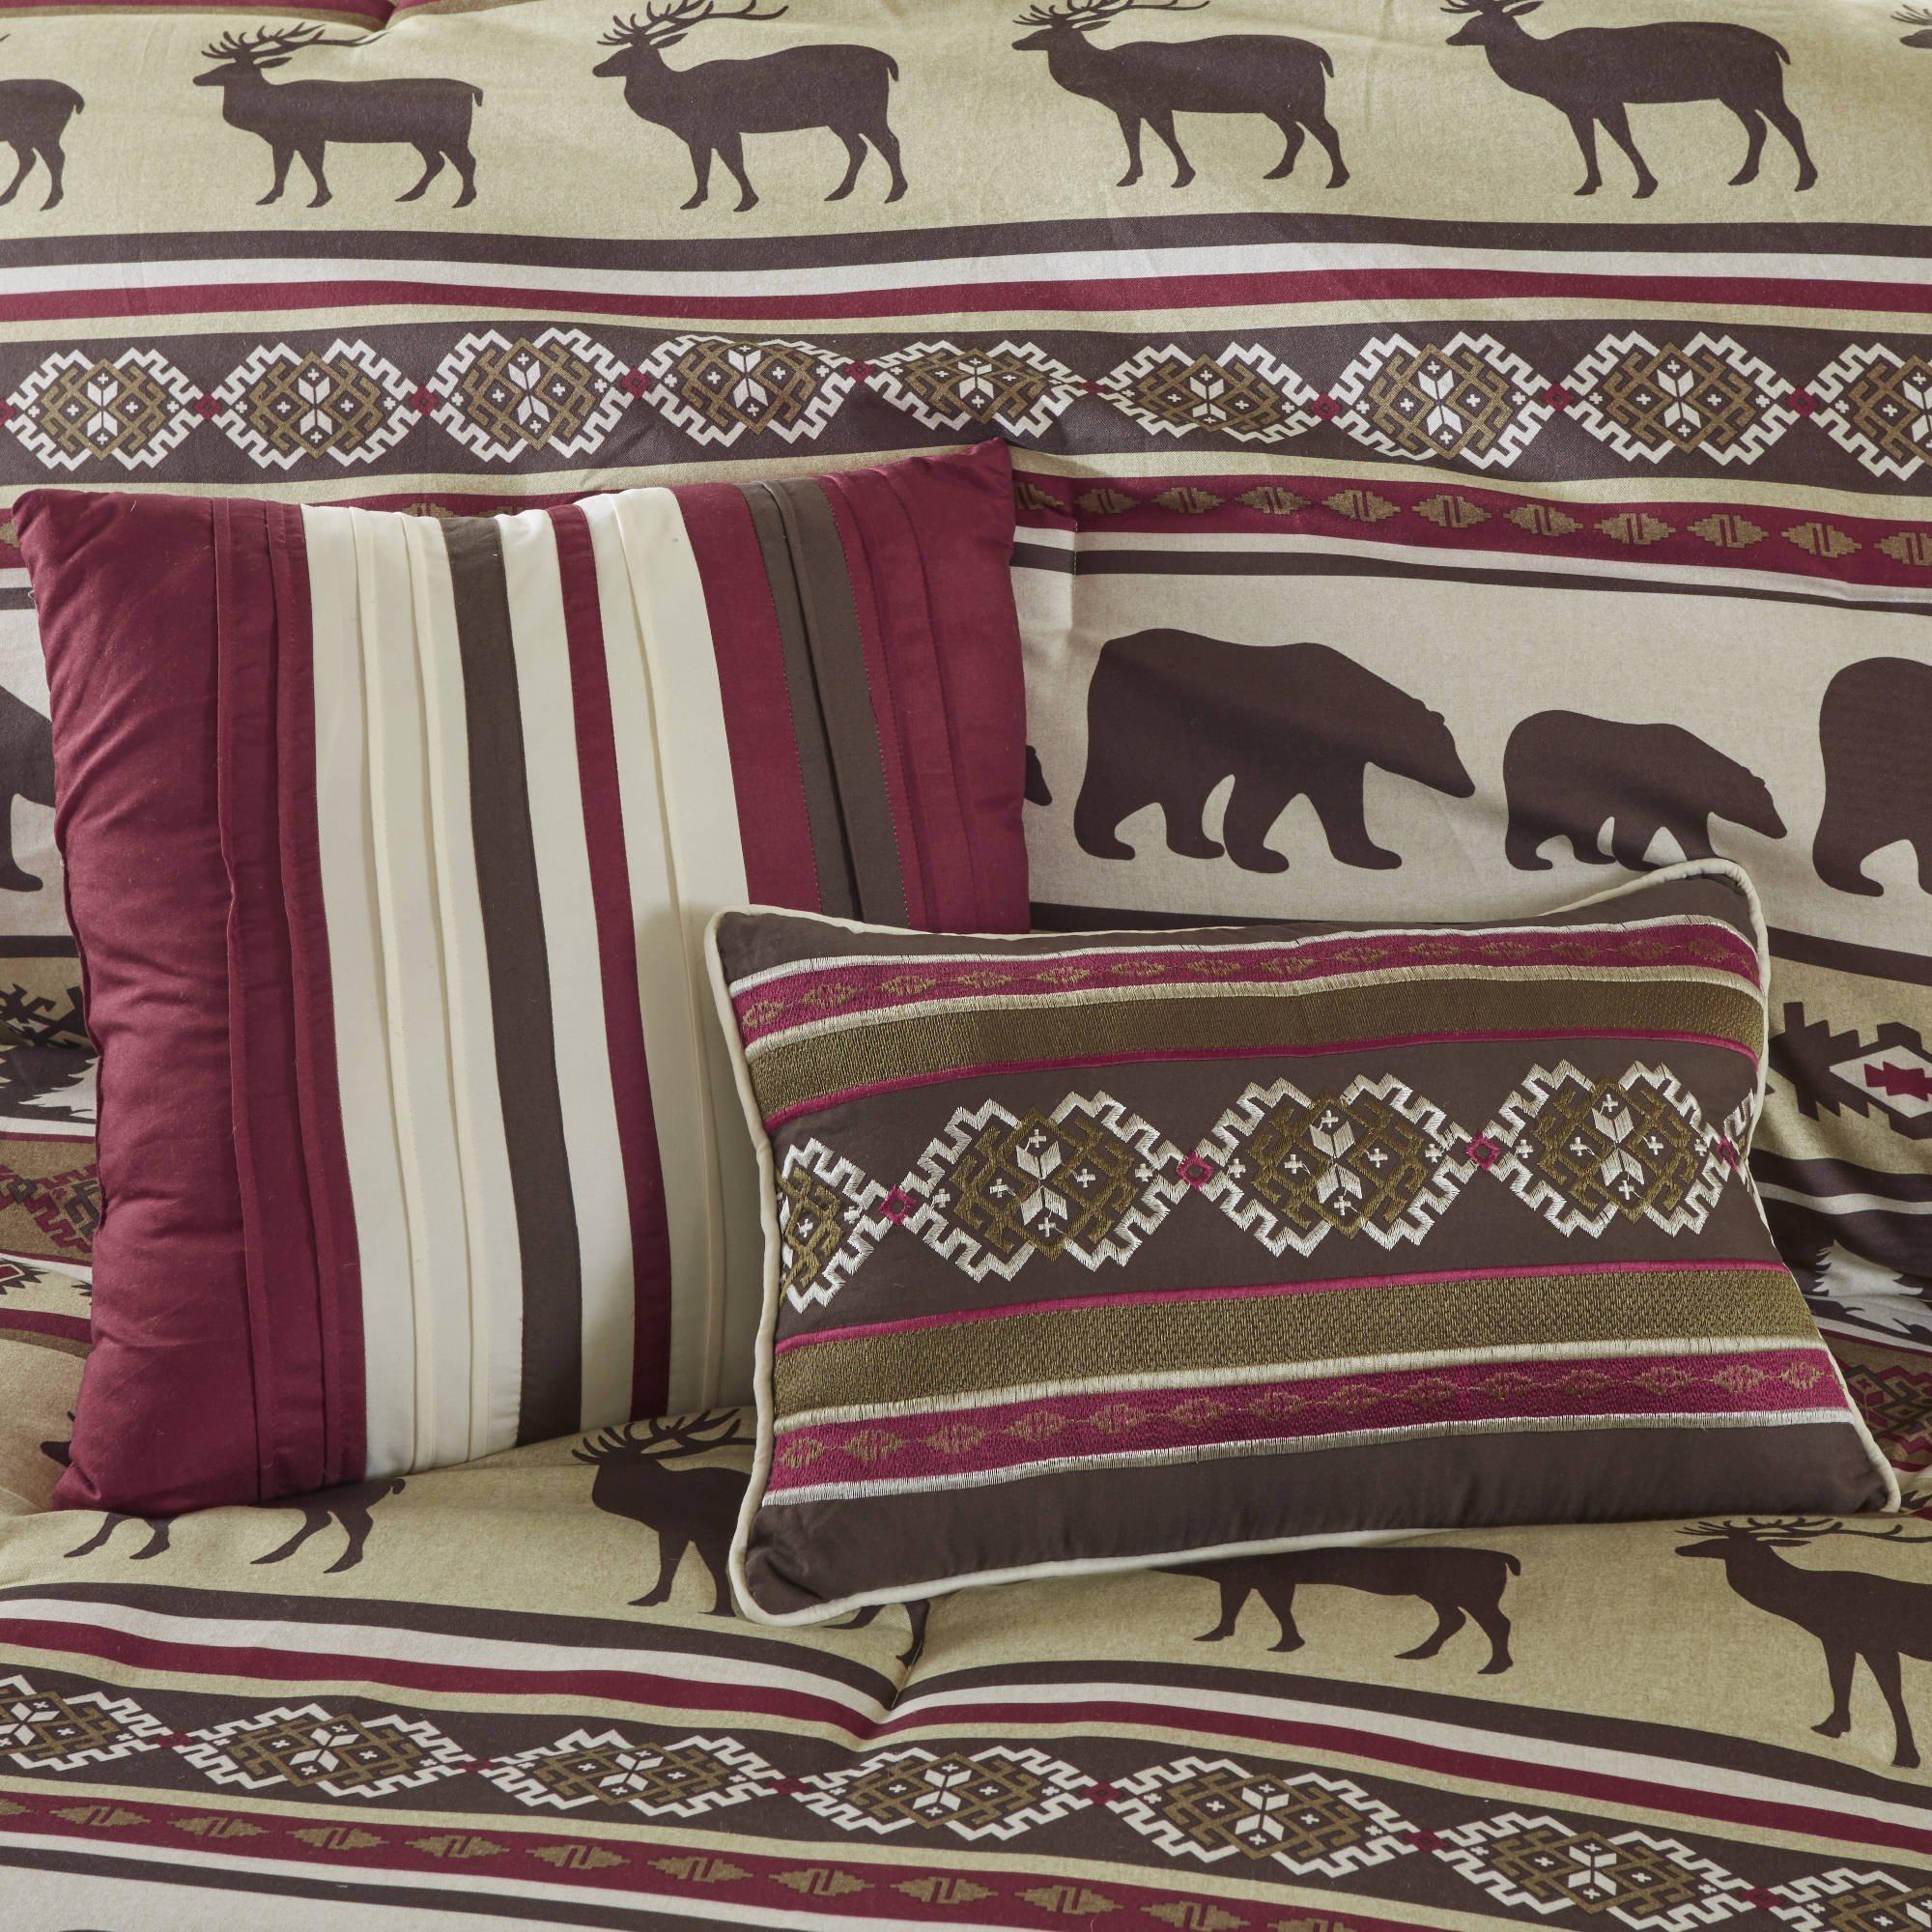 7 Piece Brown Red Cabin Lodge Stripes Pattern Comforter King Set, Beautiful Pine Trees, Bears, Elk Deer, Hunting Animal Stripe-Inspired Nature Motif Design, Soft & Comfy Bedding, Polyester, Unisex by AD (Image #3)